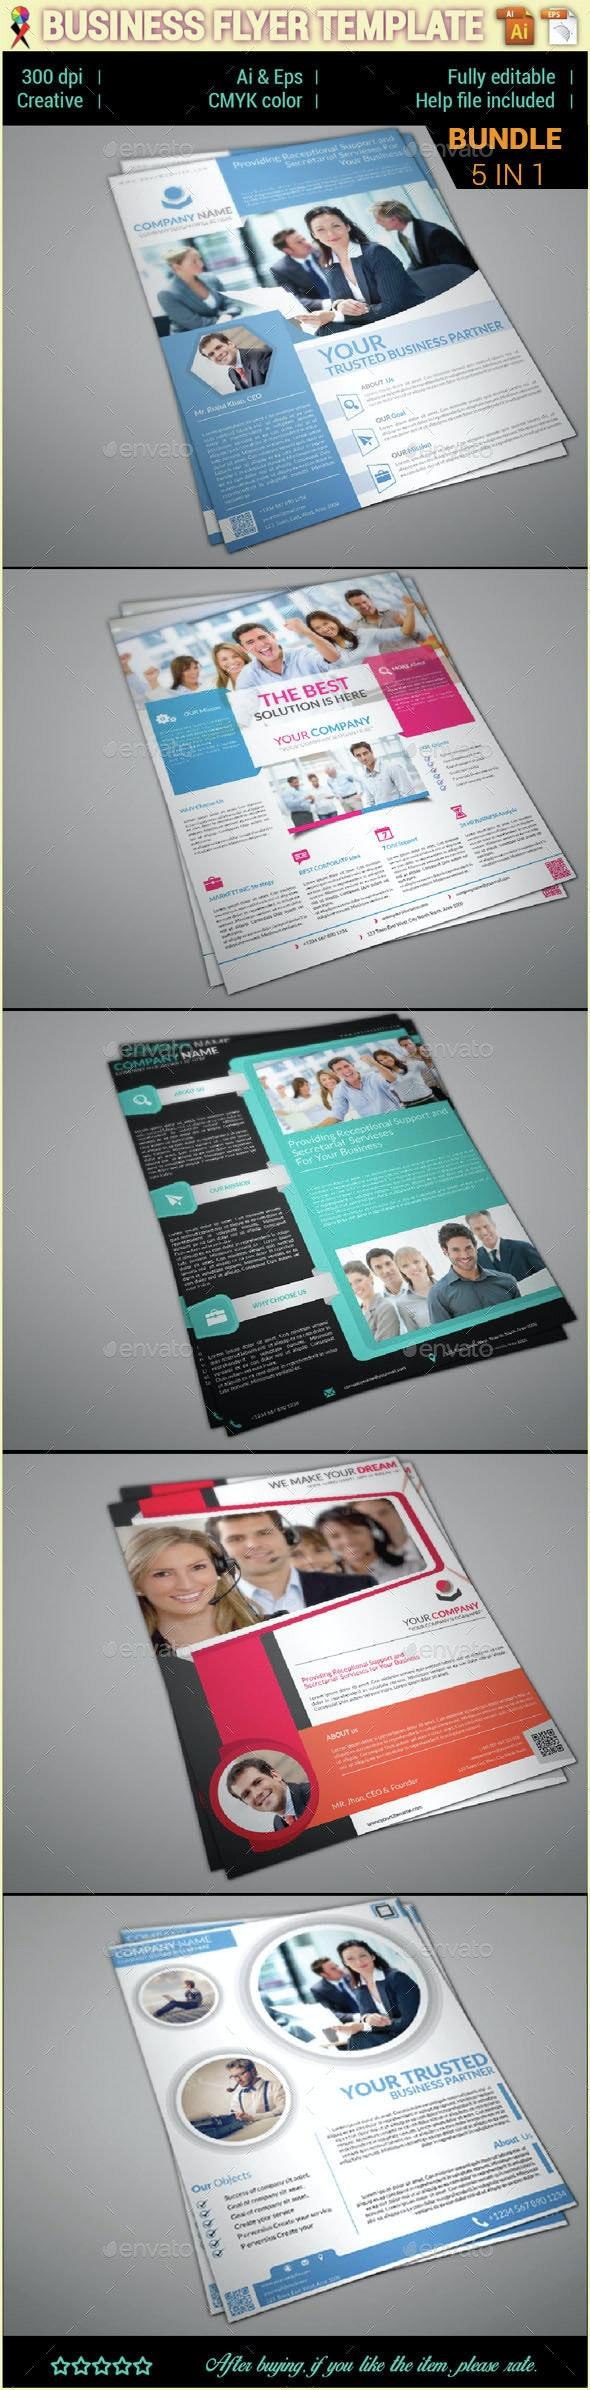 Corporate Business Flyer Template Bundle - Corporate Flyers